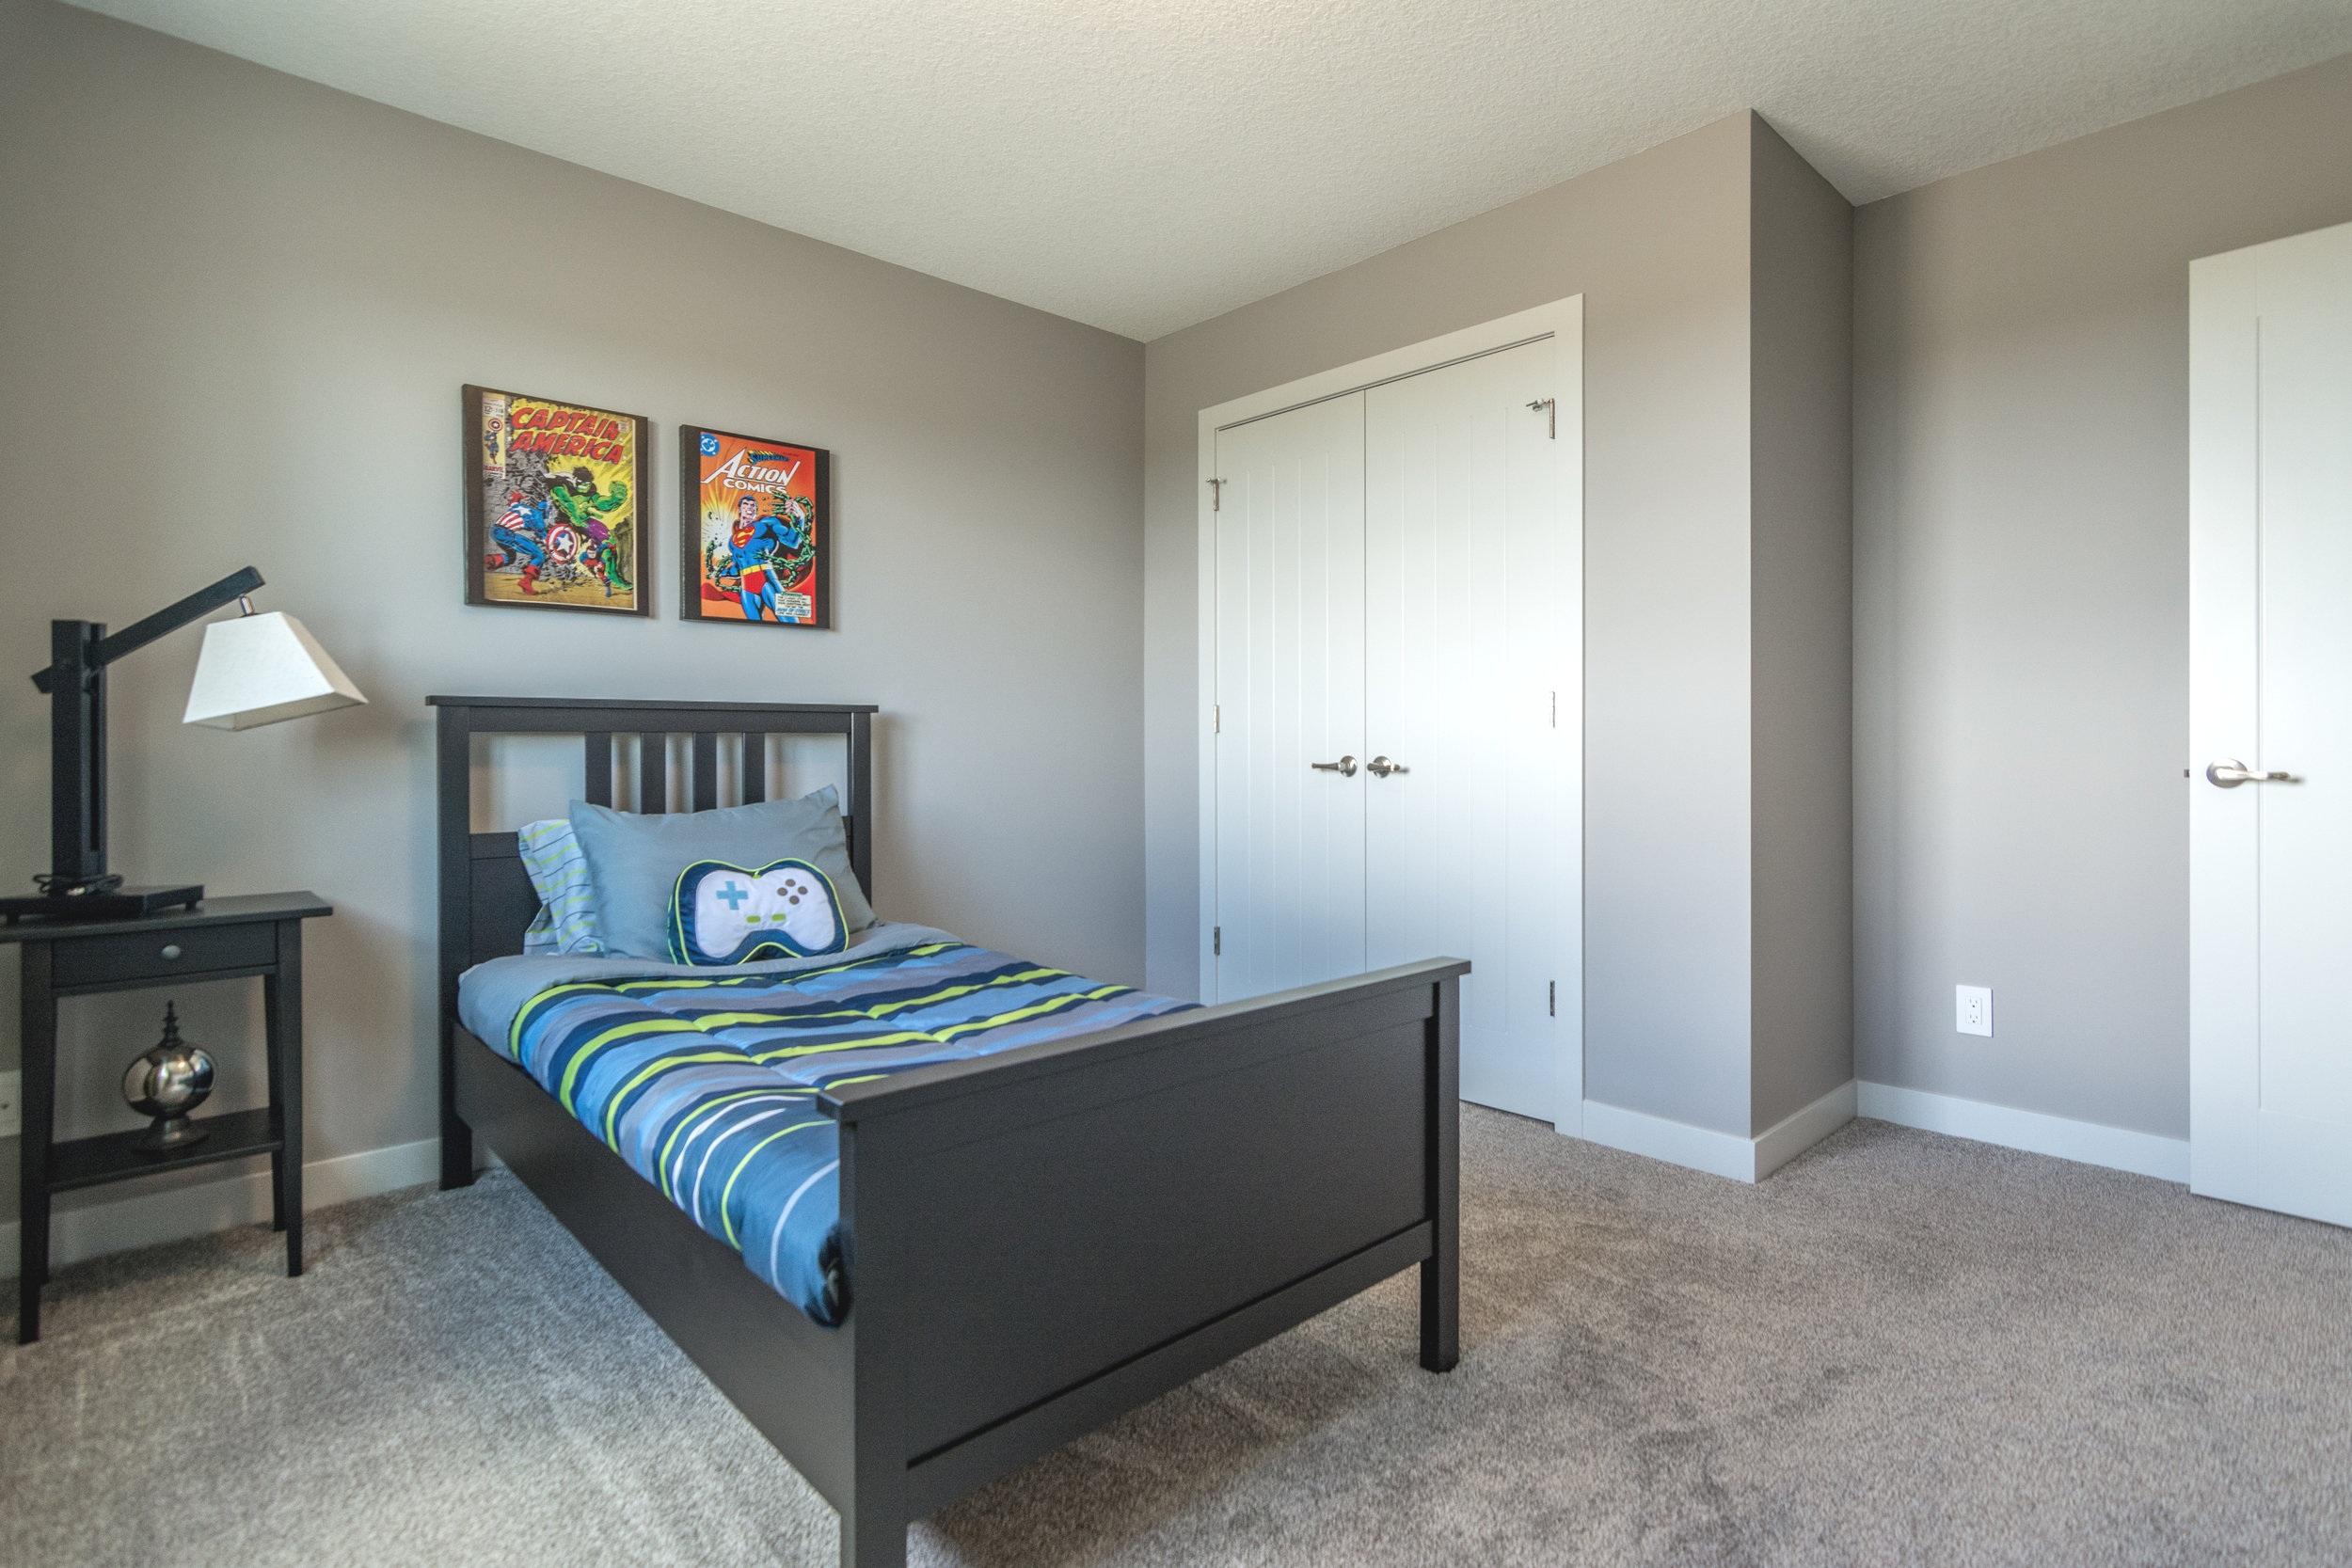 47-bedroom+3-2-1658.jpg